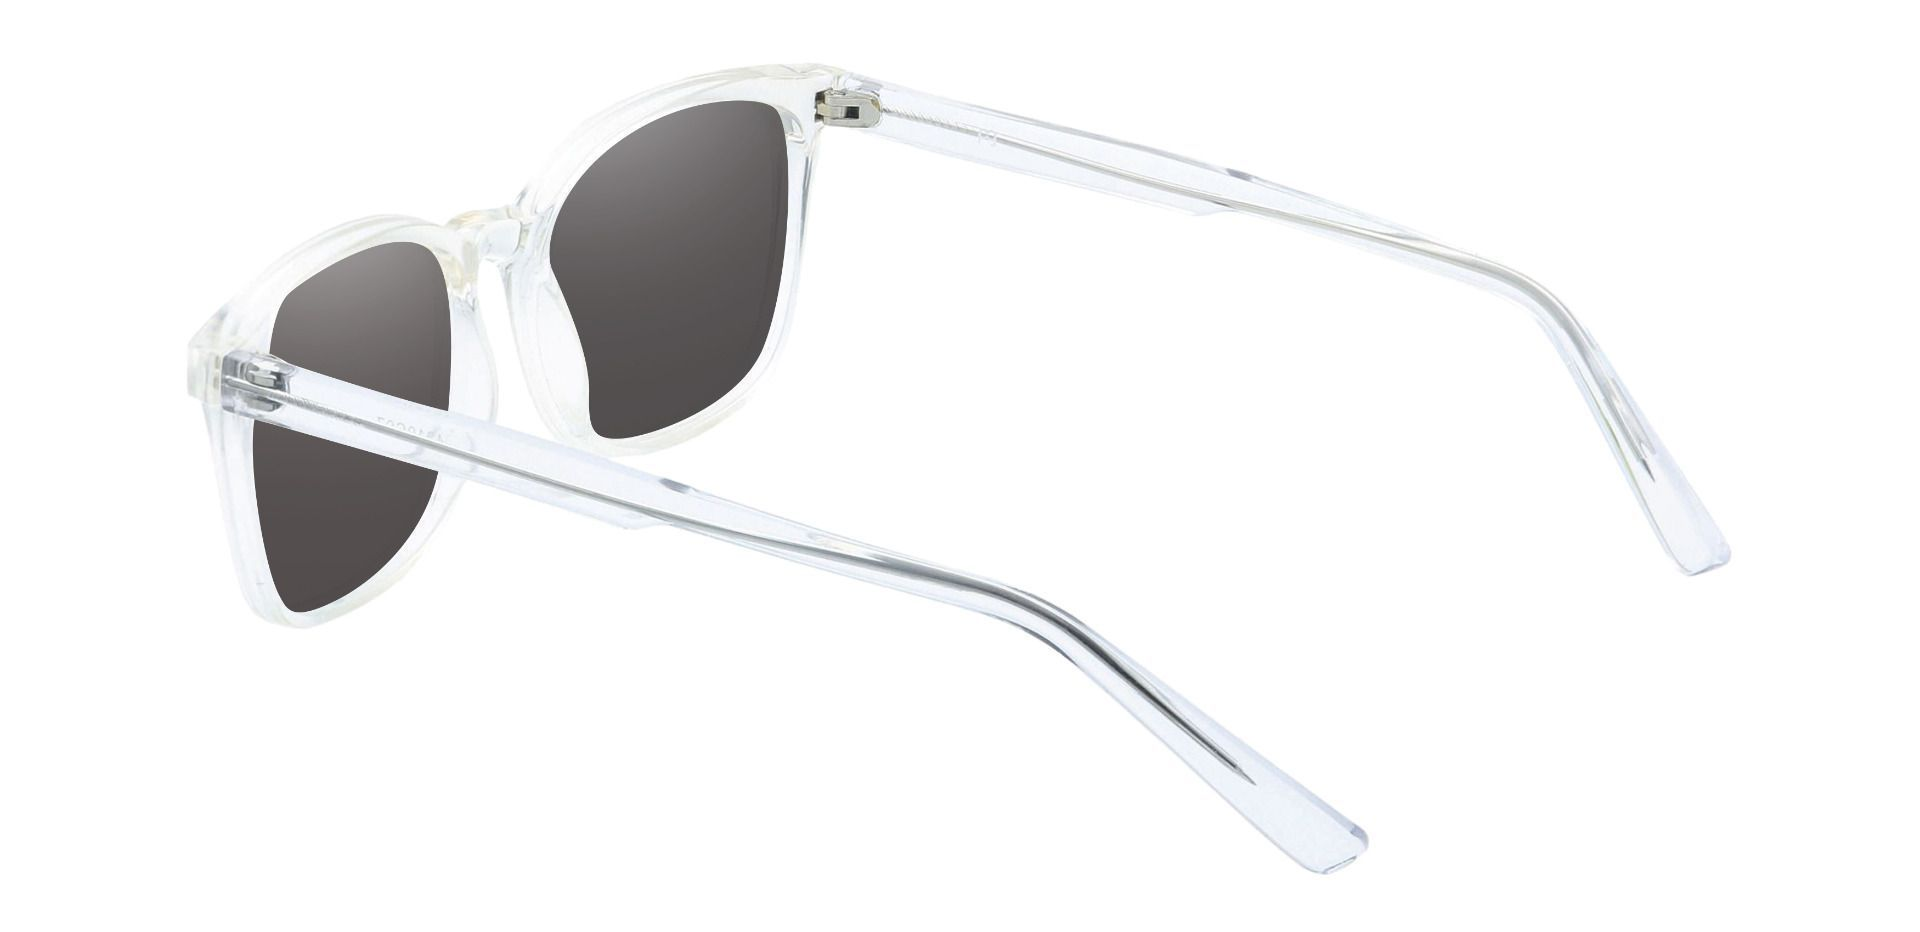 Windsor Rectangle Prescription Sunglasses - Clear Frame With Gray Lenses